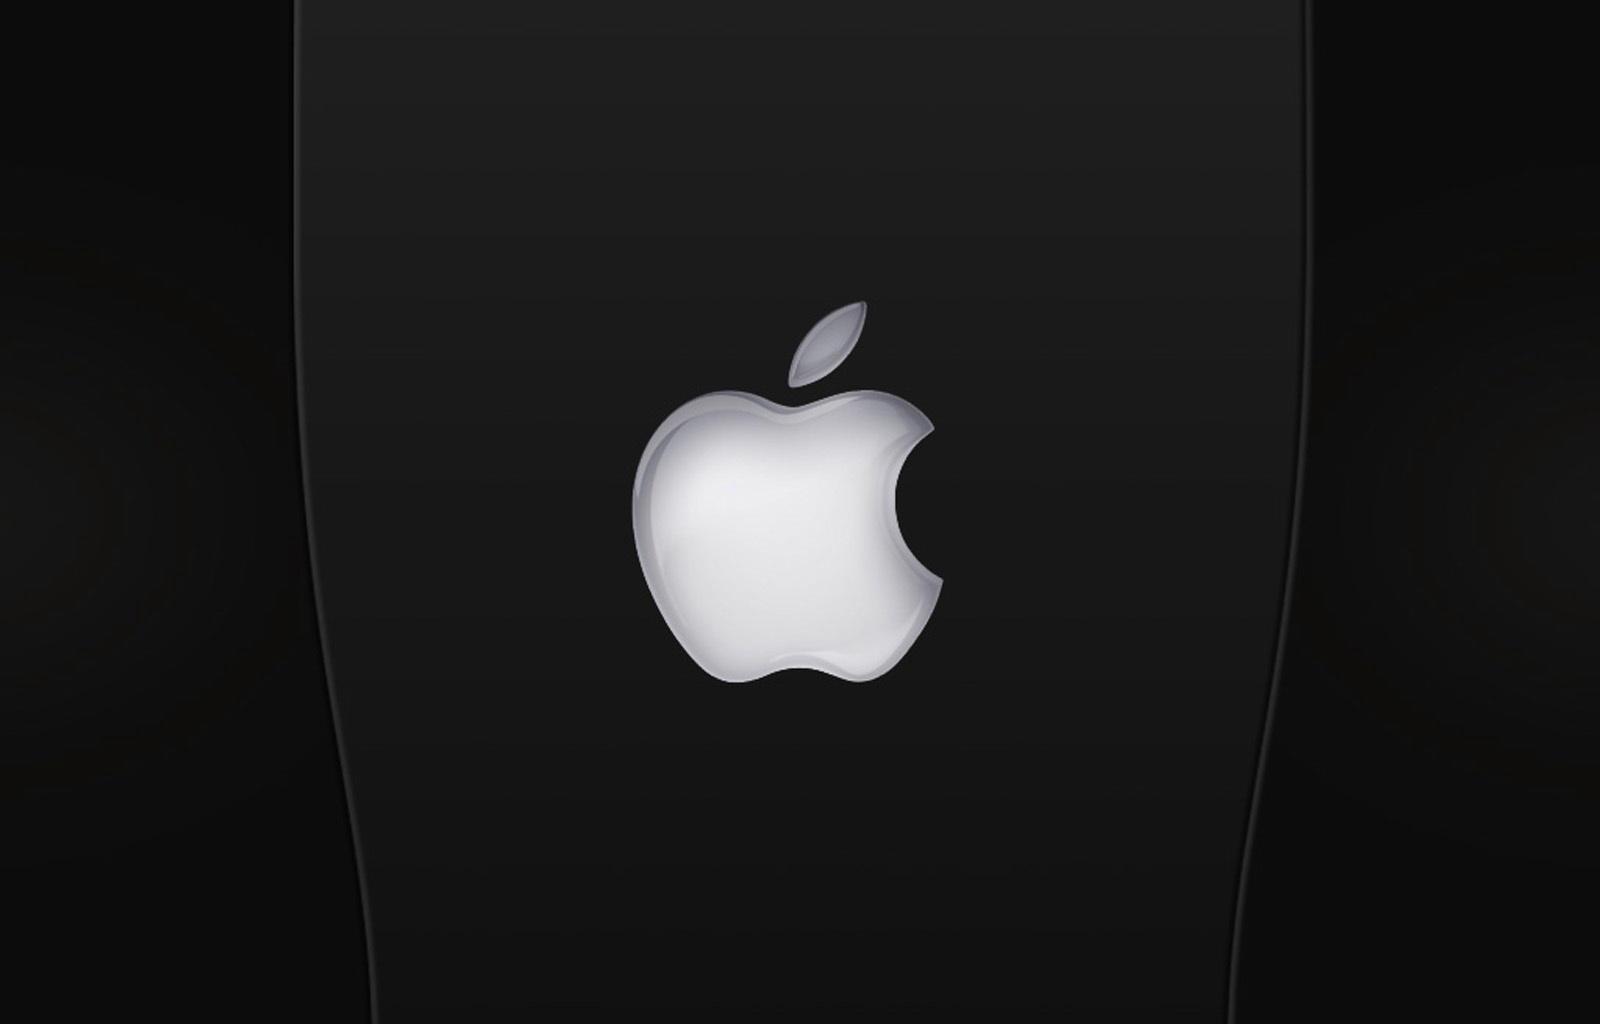 OldPowerbook_harlequin1989 by Apple-Group